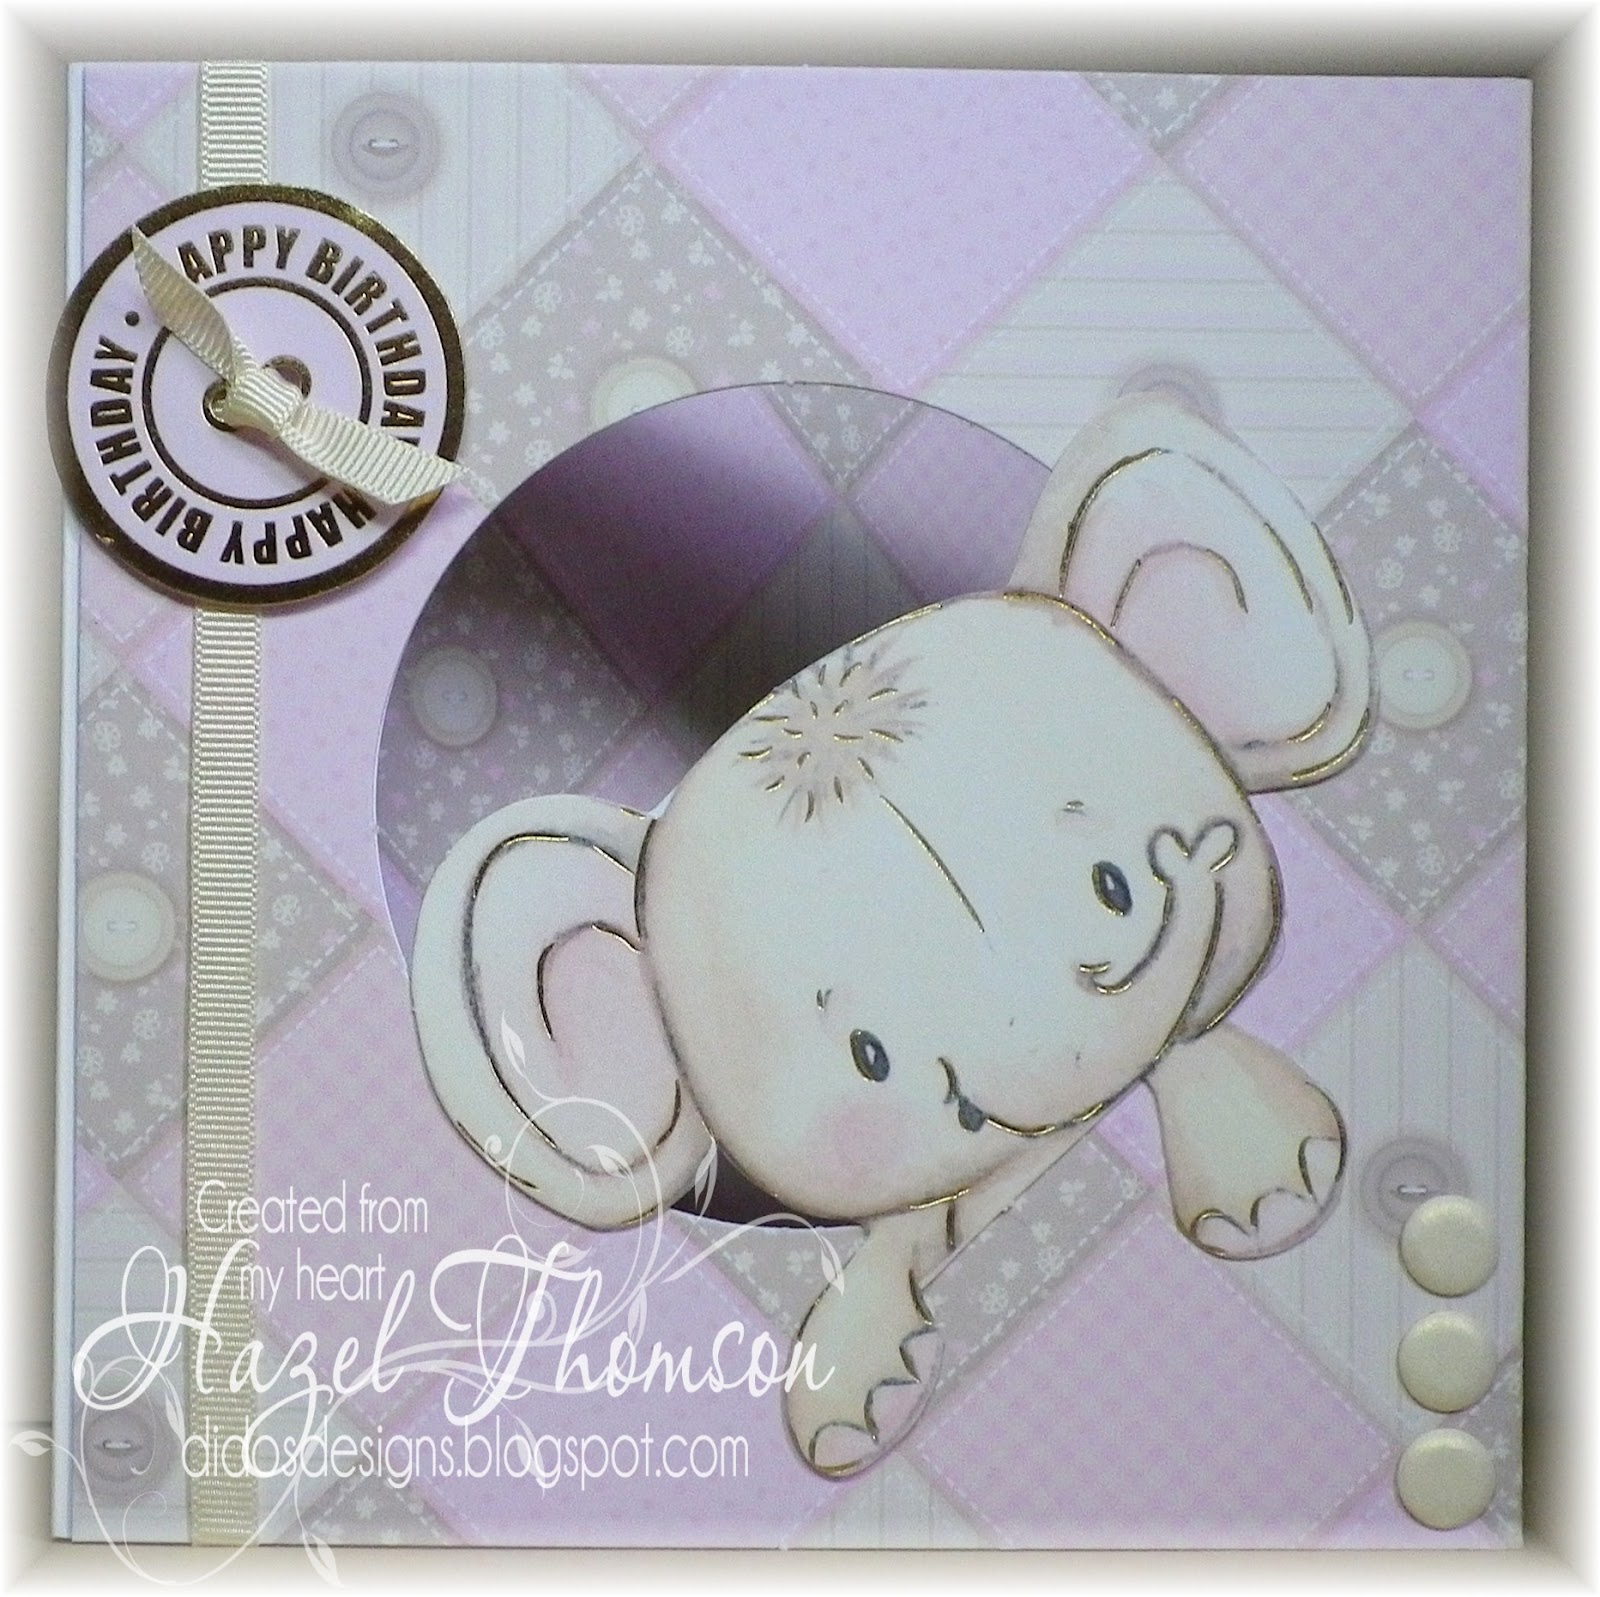 http://2.bp.blogspot.com/-Bu9GpH1UsBg/T6ajxTv7XzI/AAAAAAAAHEo/1-XsD1vmH40/s1600/Cards+By+Dido\'s+Designs+009.JPG